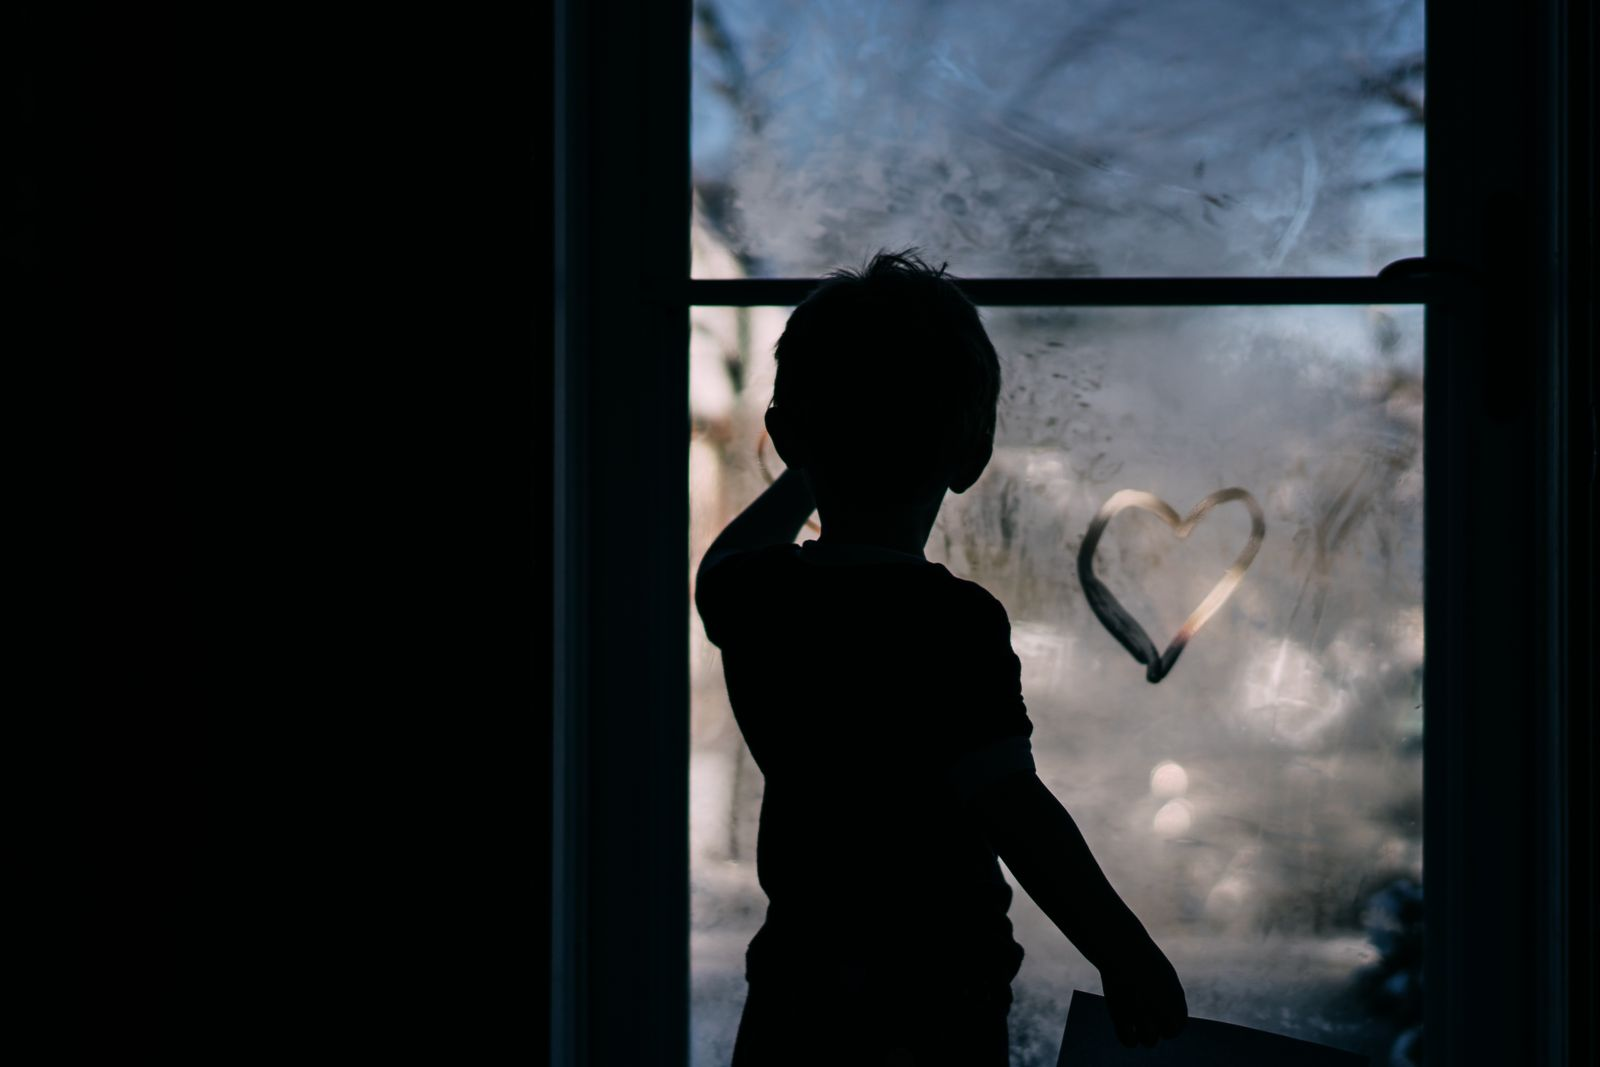 A little boy draws a heart on a foggy storm door.